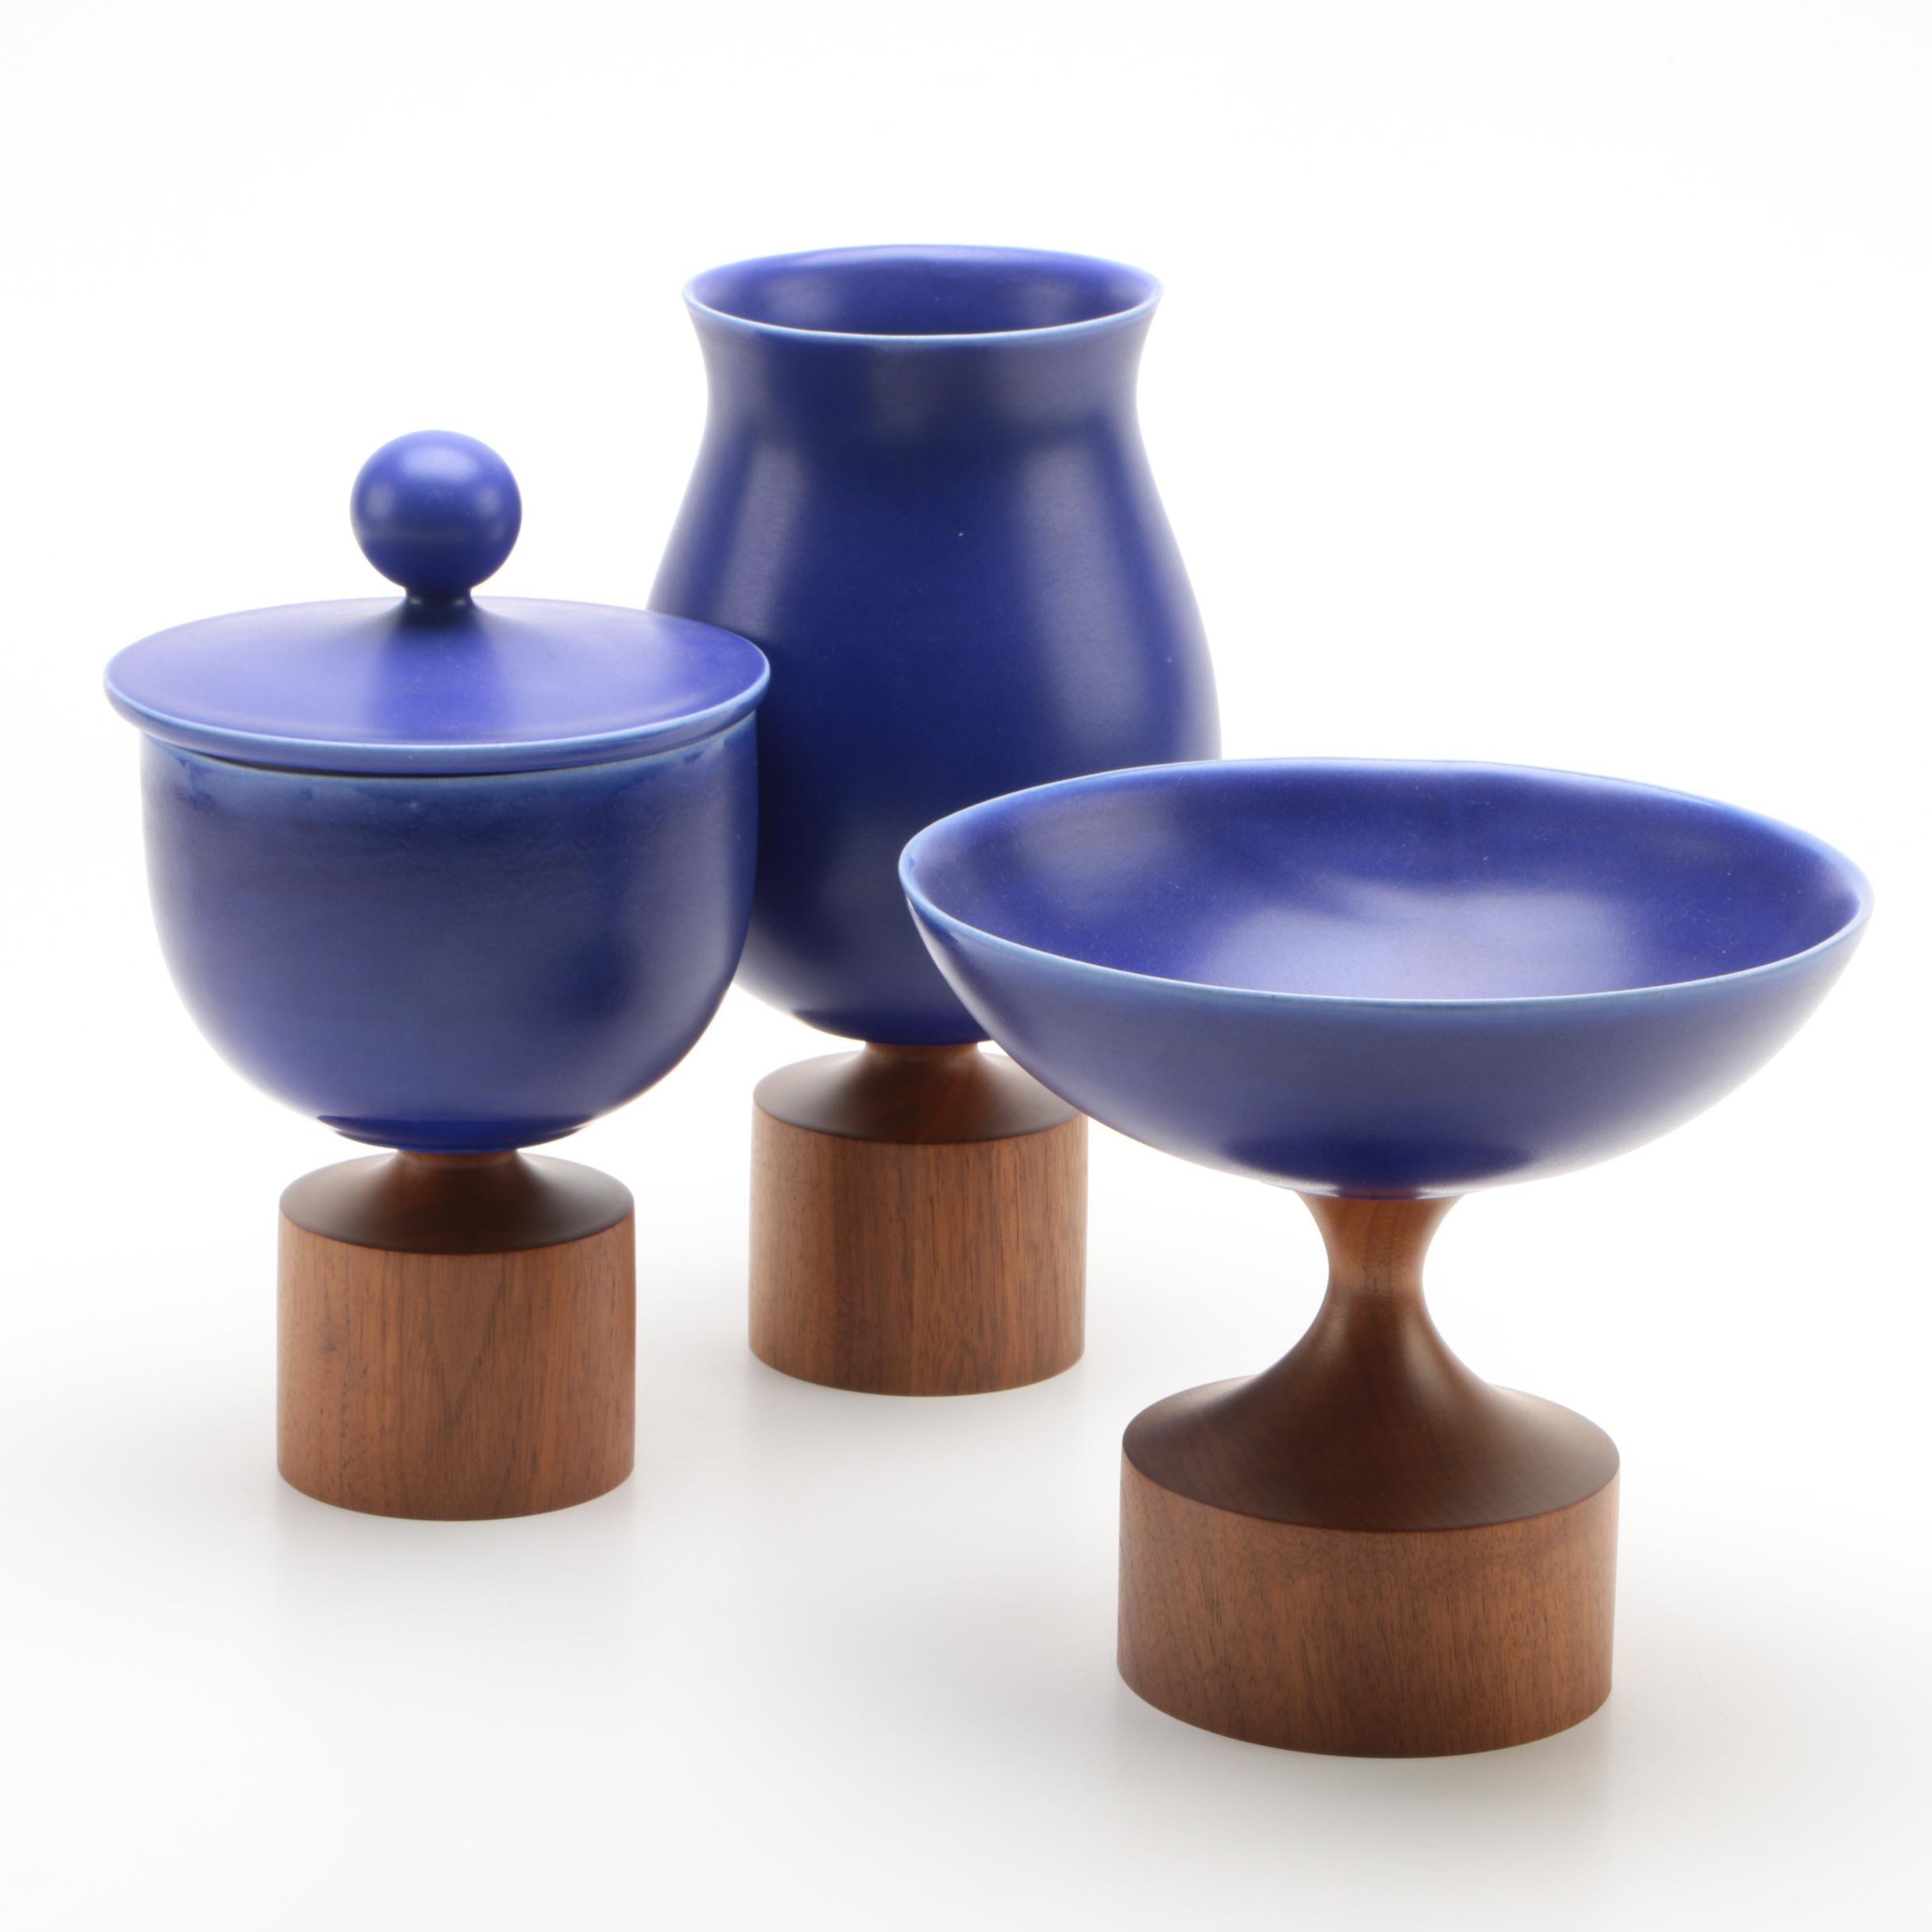 KleinReid Handmade Porcelain and Walnut Serveware and Vase